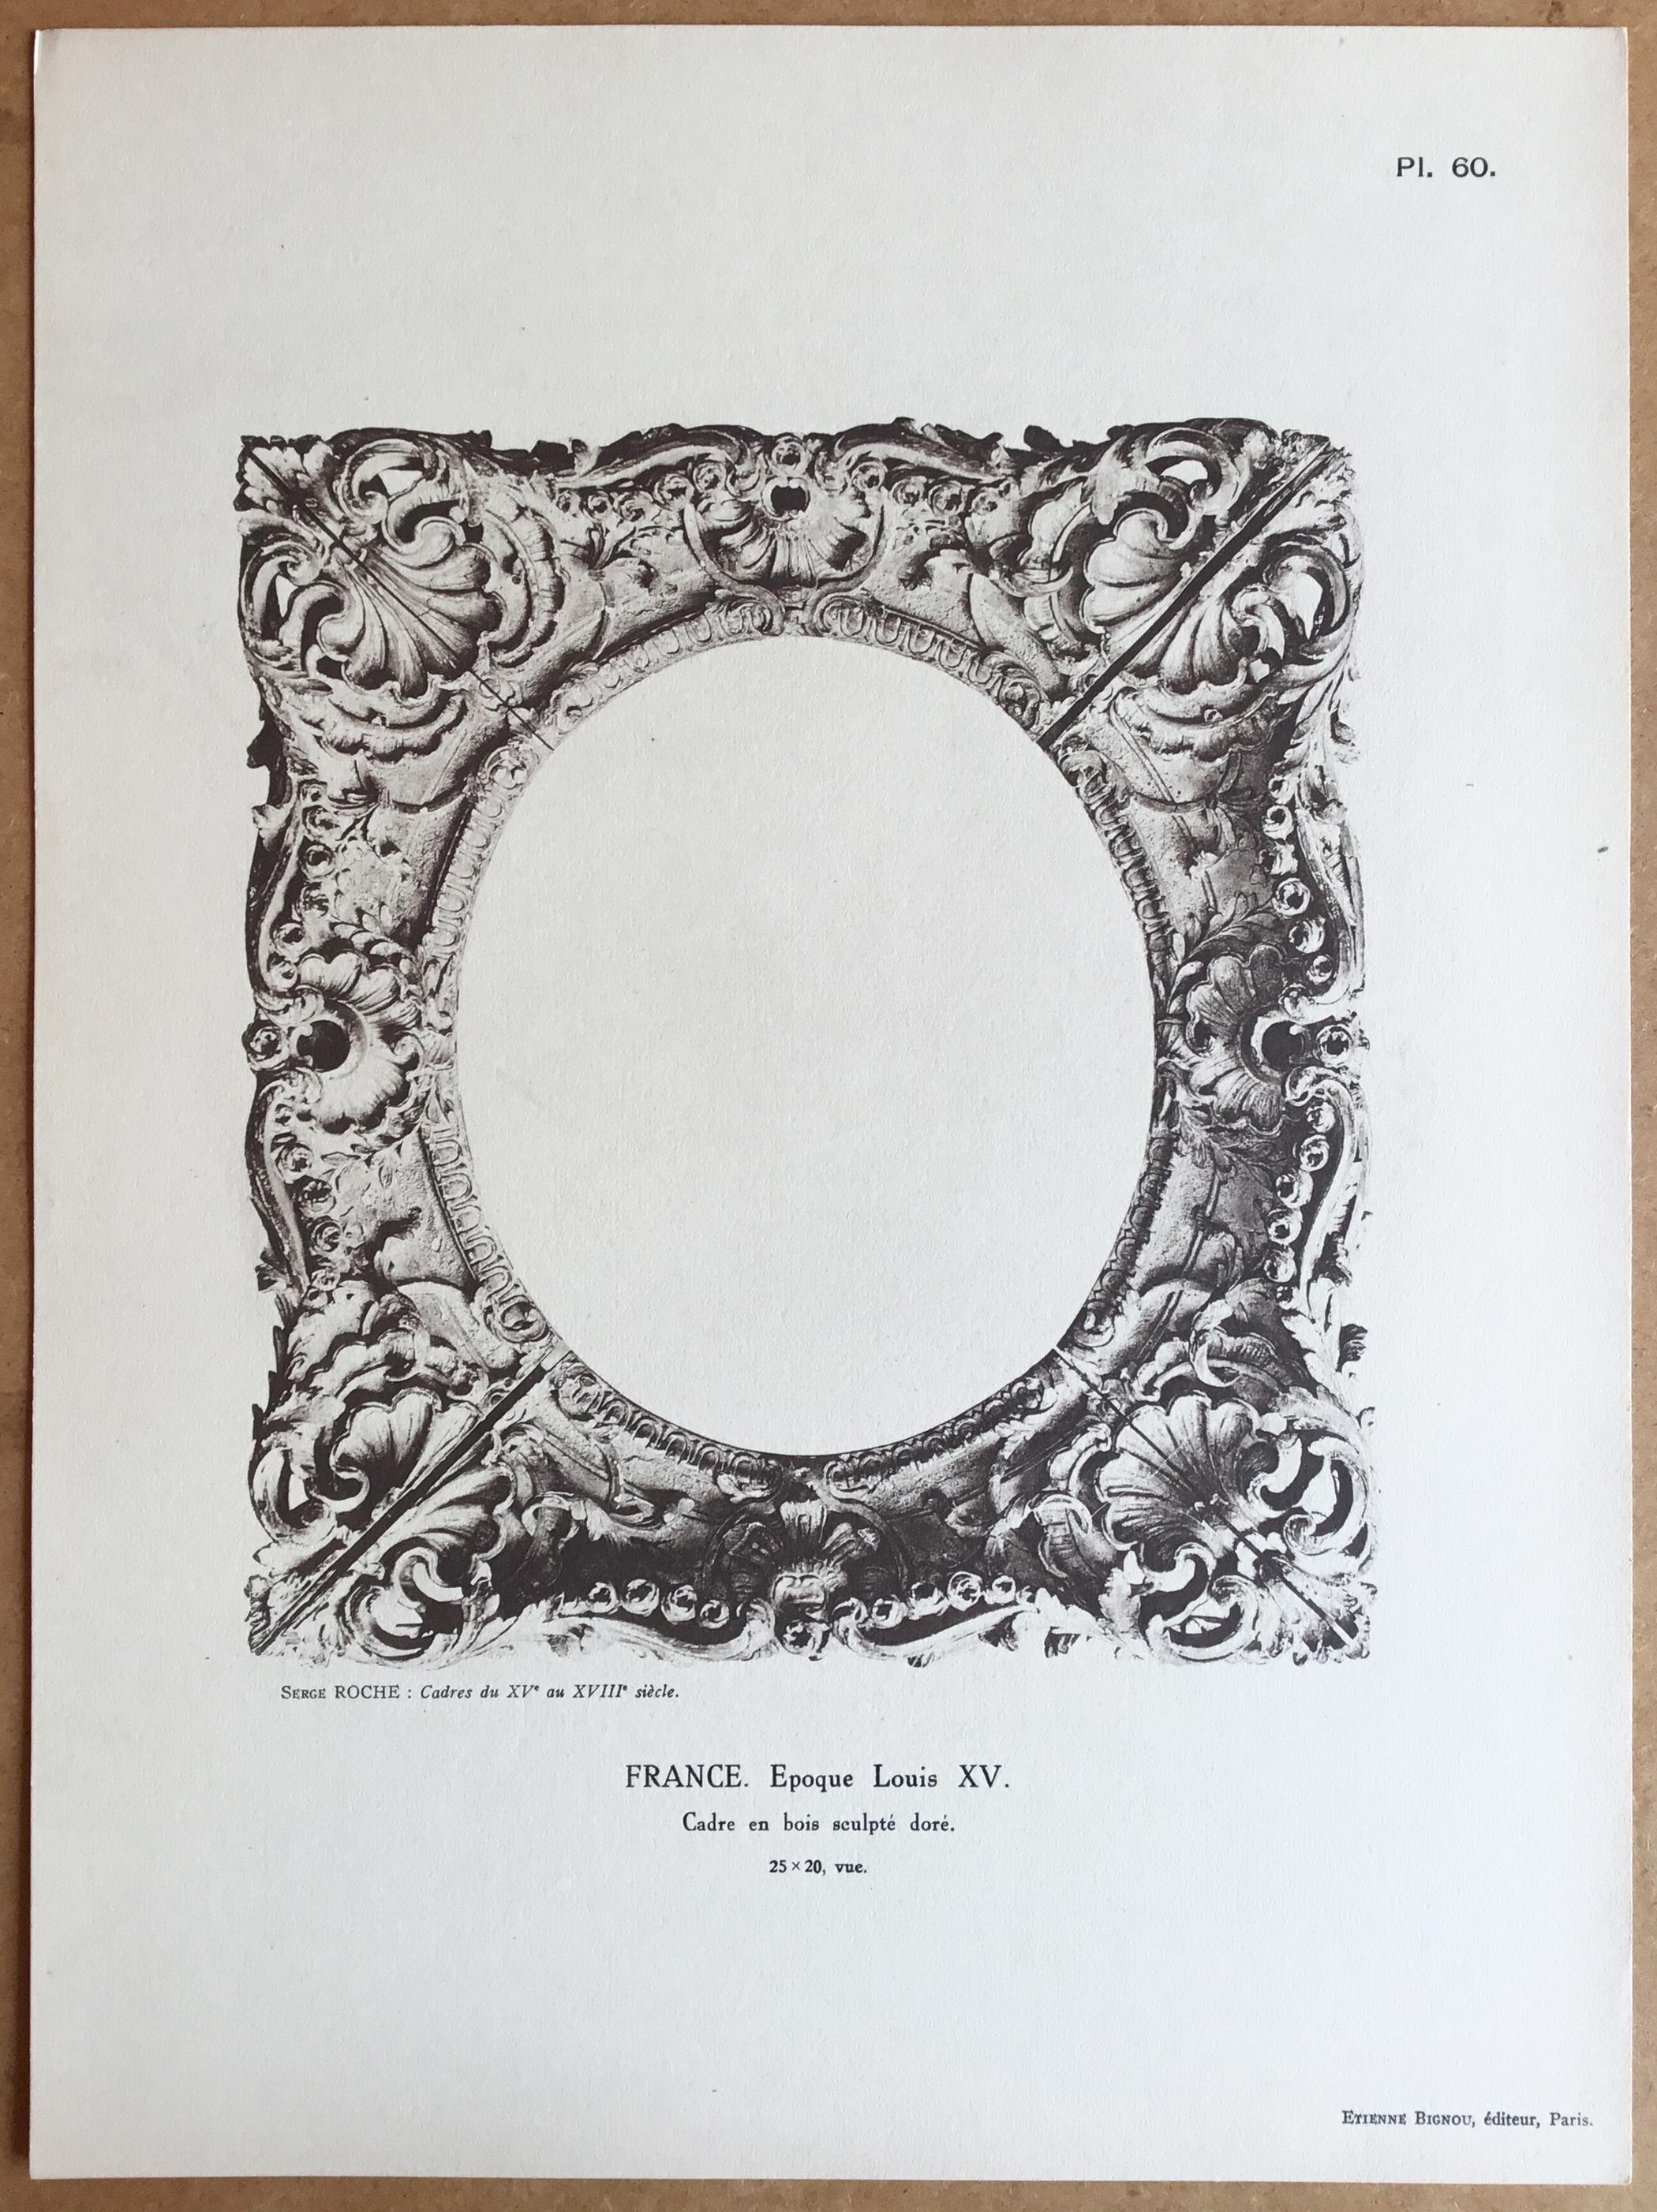 28 Plate 60